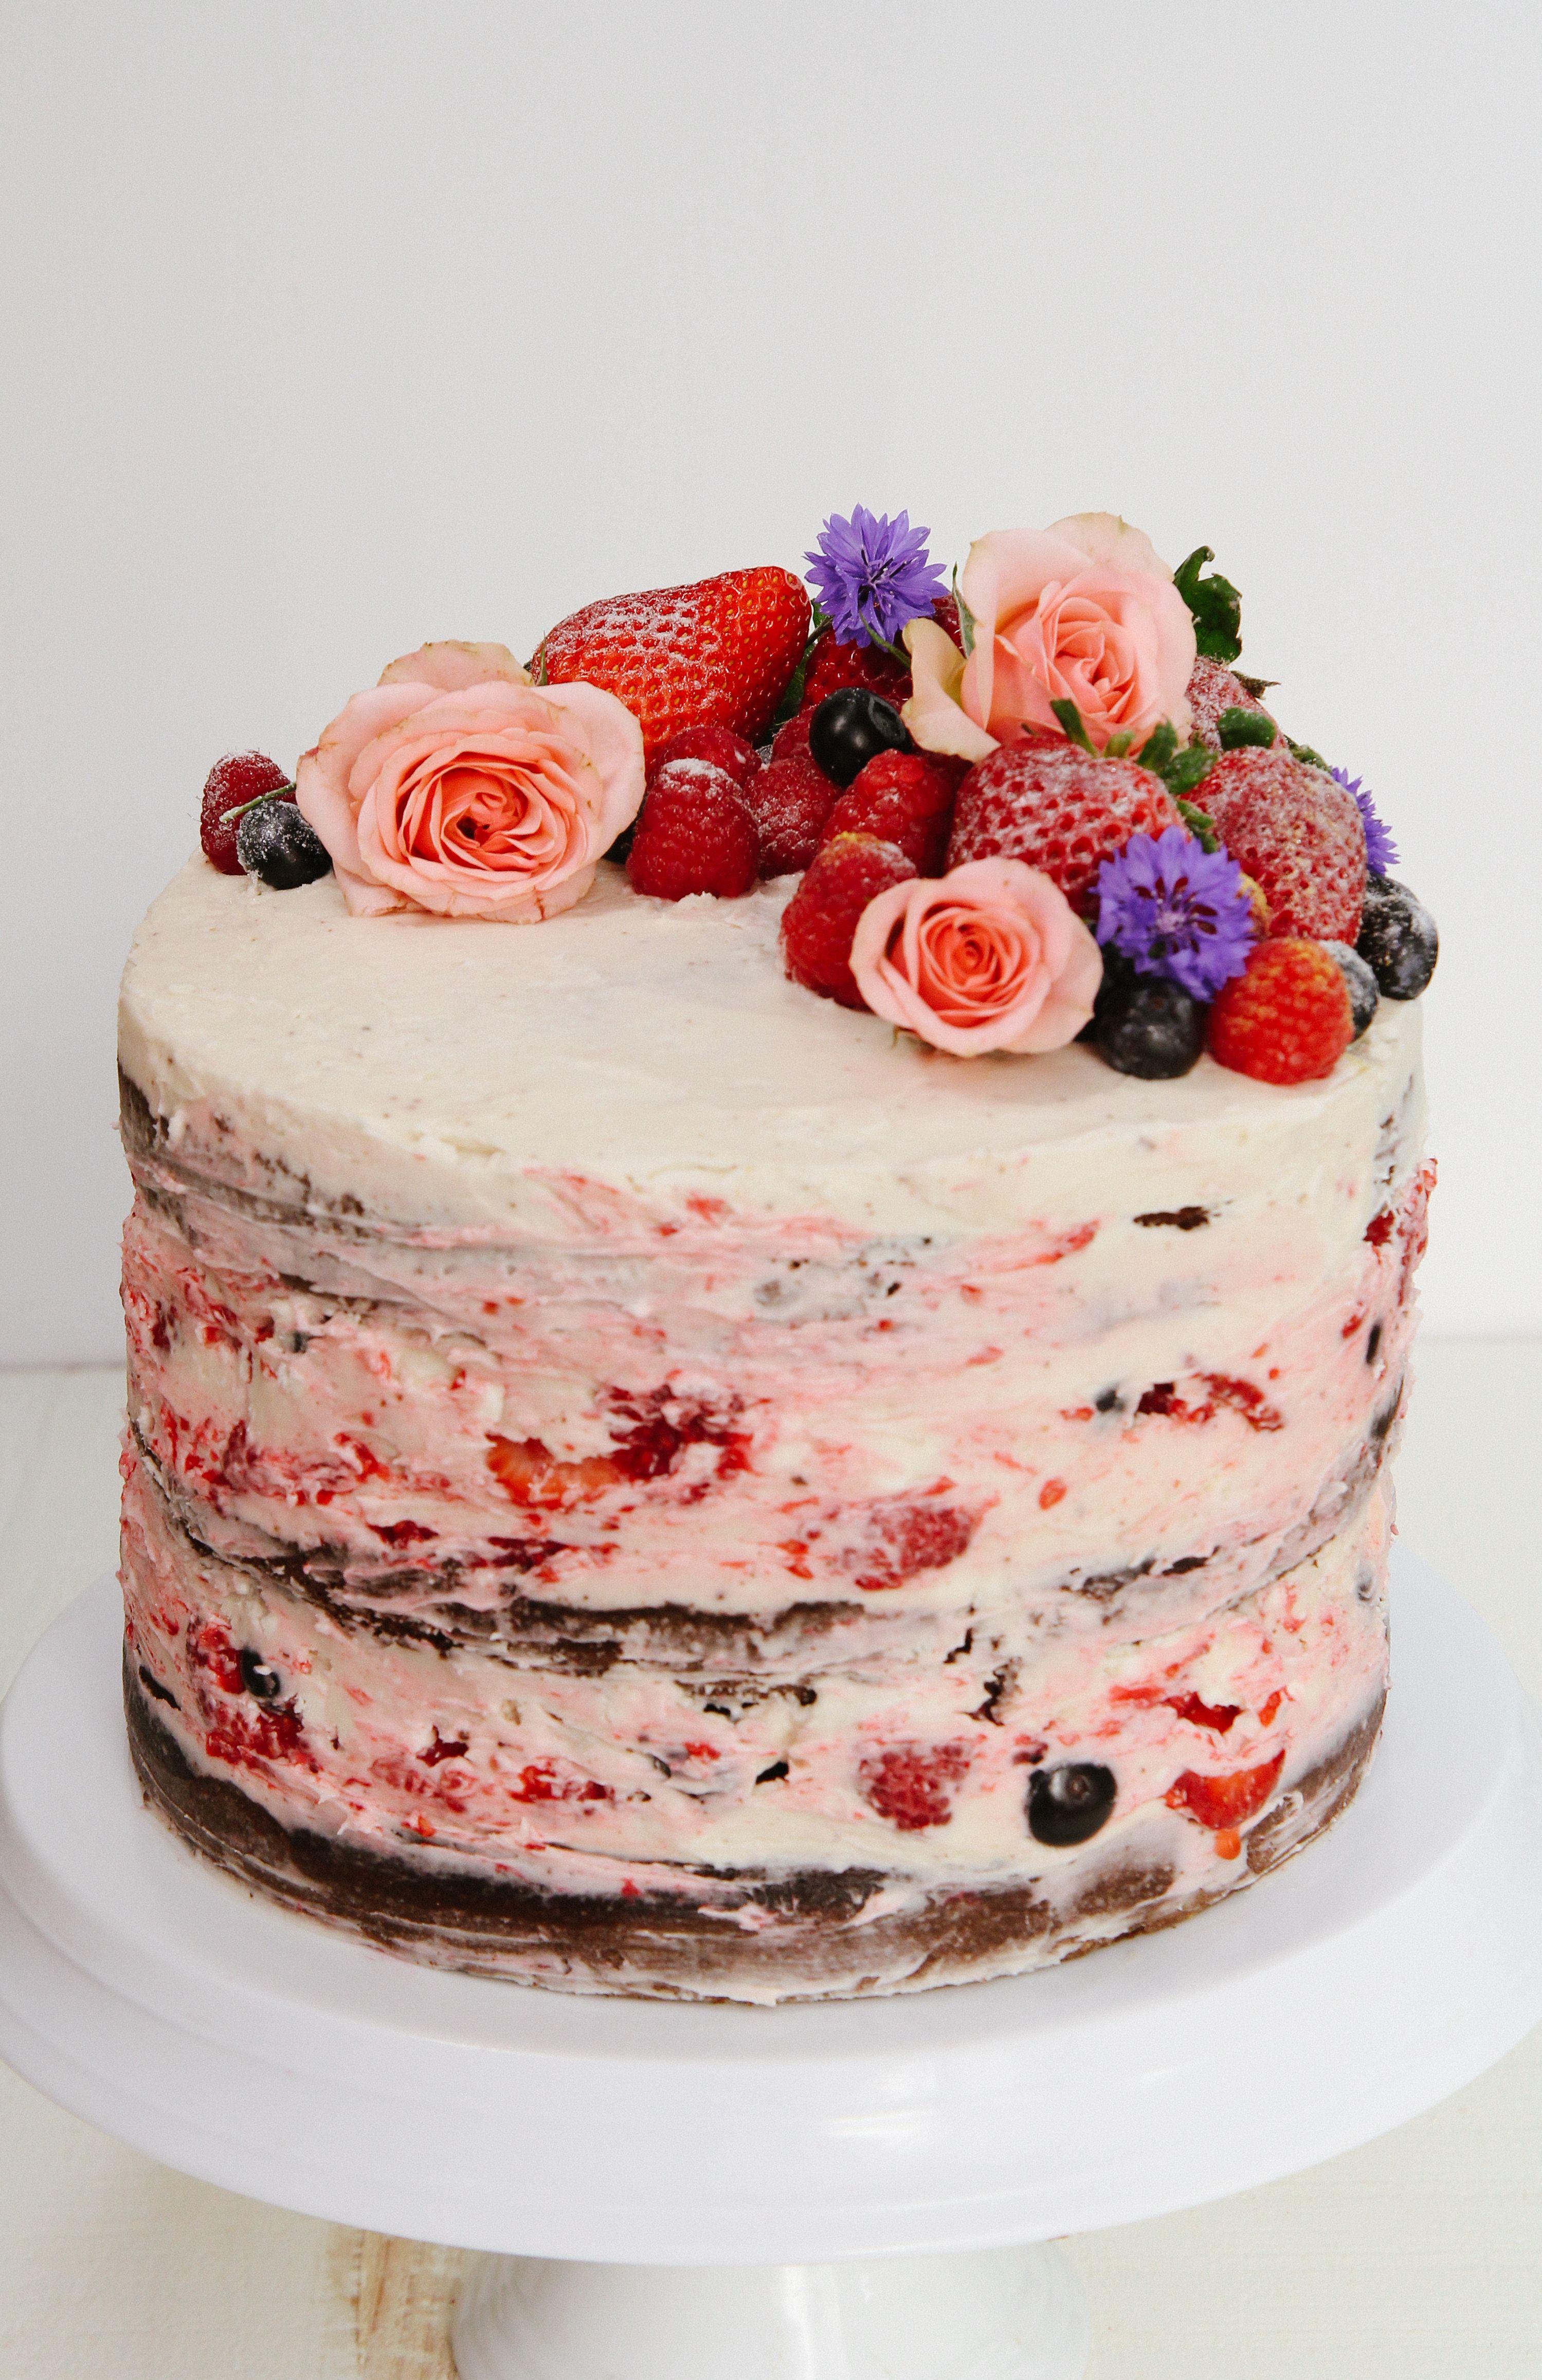 3 Layer Chocolate Almond Birthday Cake A Rich Fluffy Legit Paleo